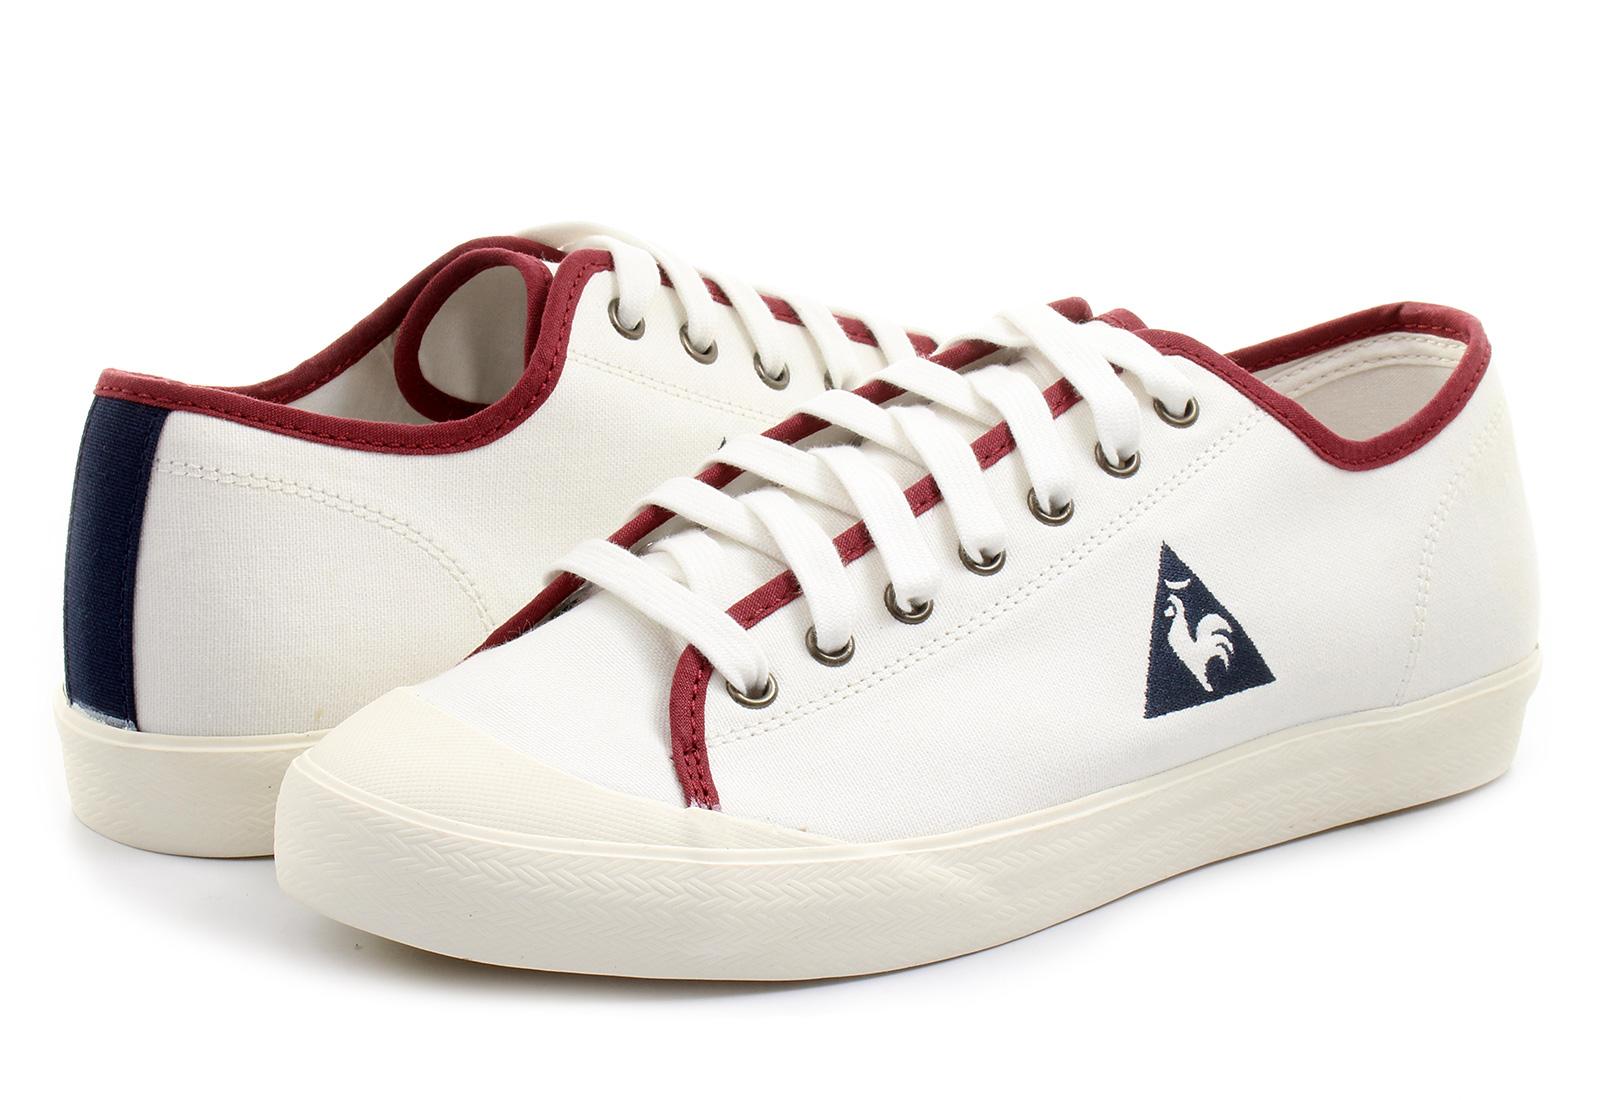 le coq sportif shoes estoril 1511282 online shop for. Black Bedroom Furniture Sets. Home Design Ideas